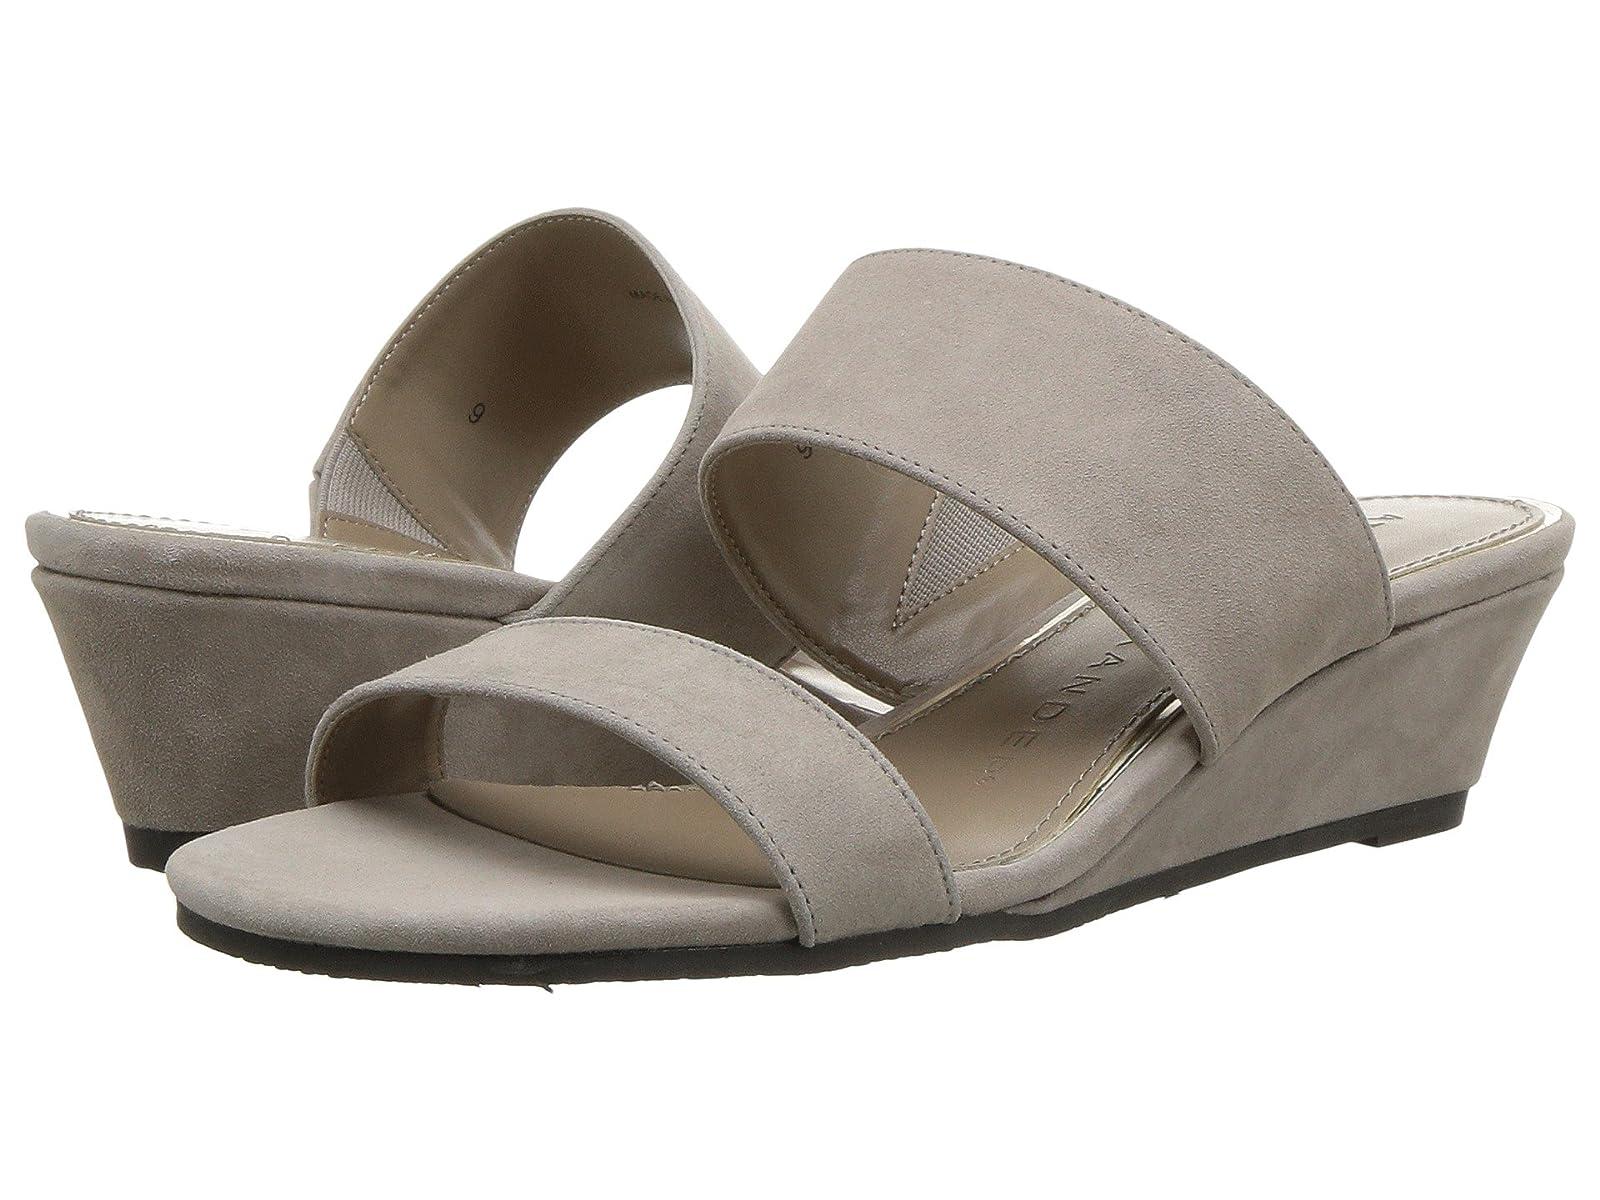 Athena Alexander BurlingtonAtmospheric grades have affordable shoes